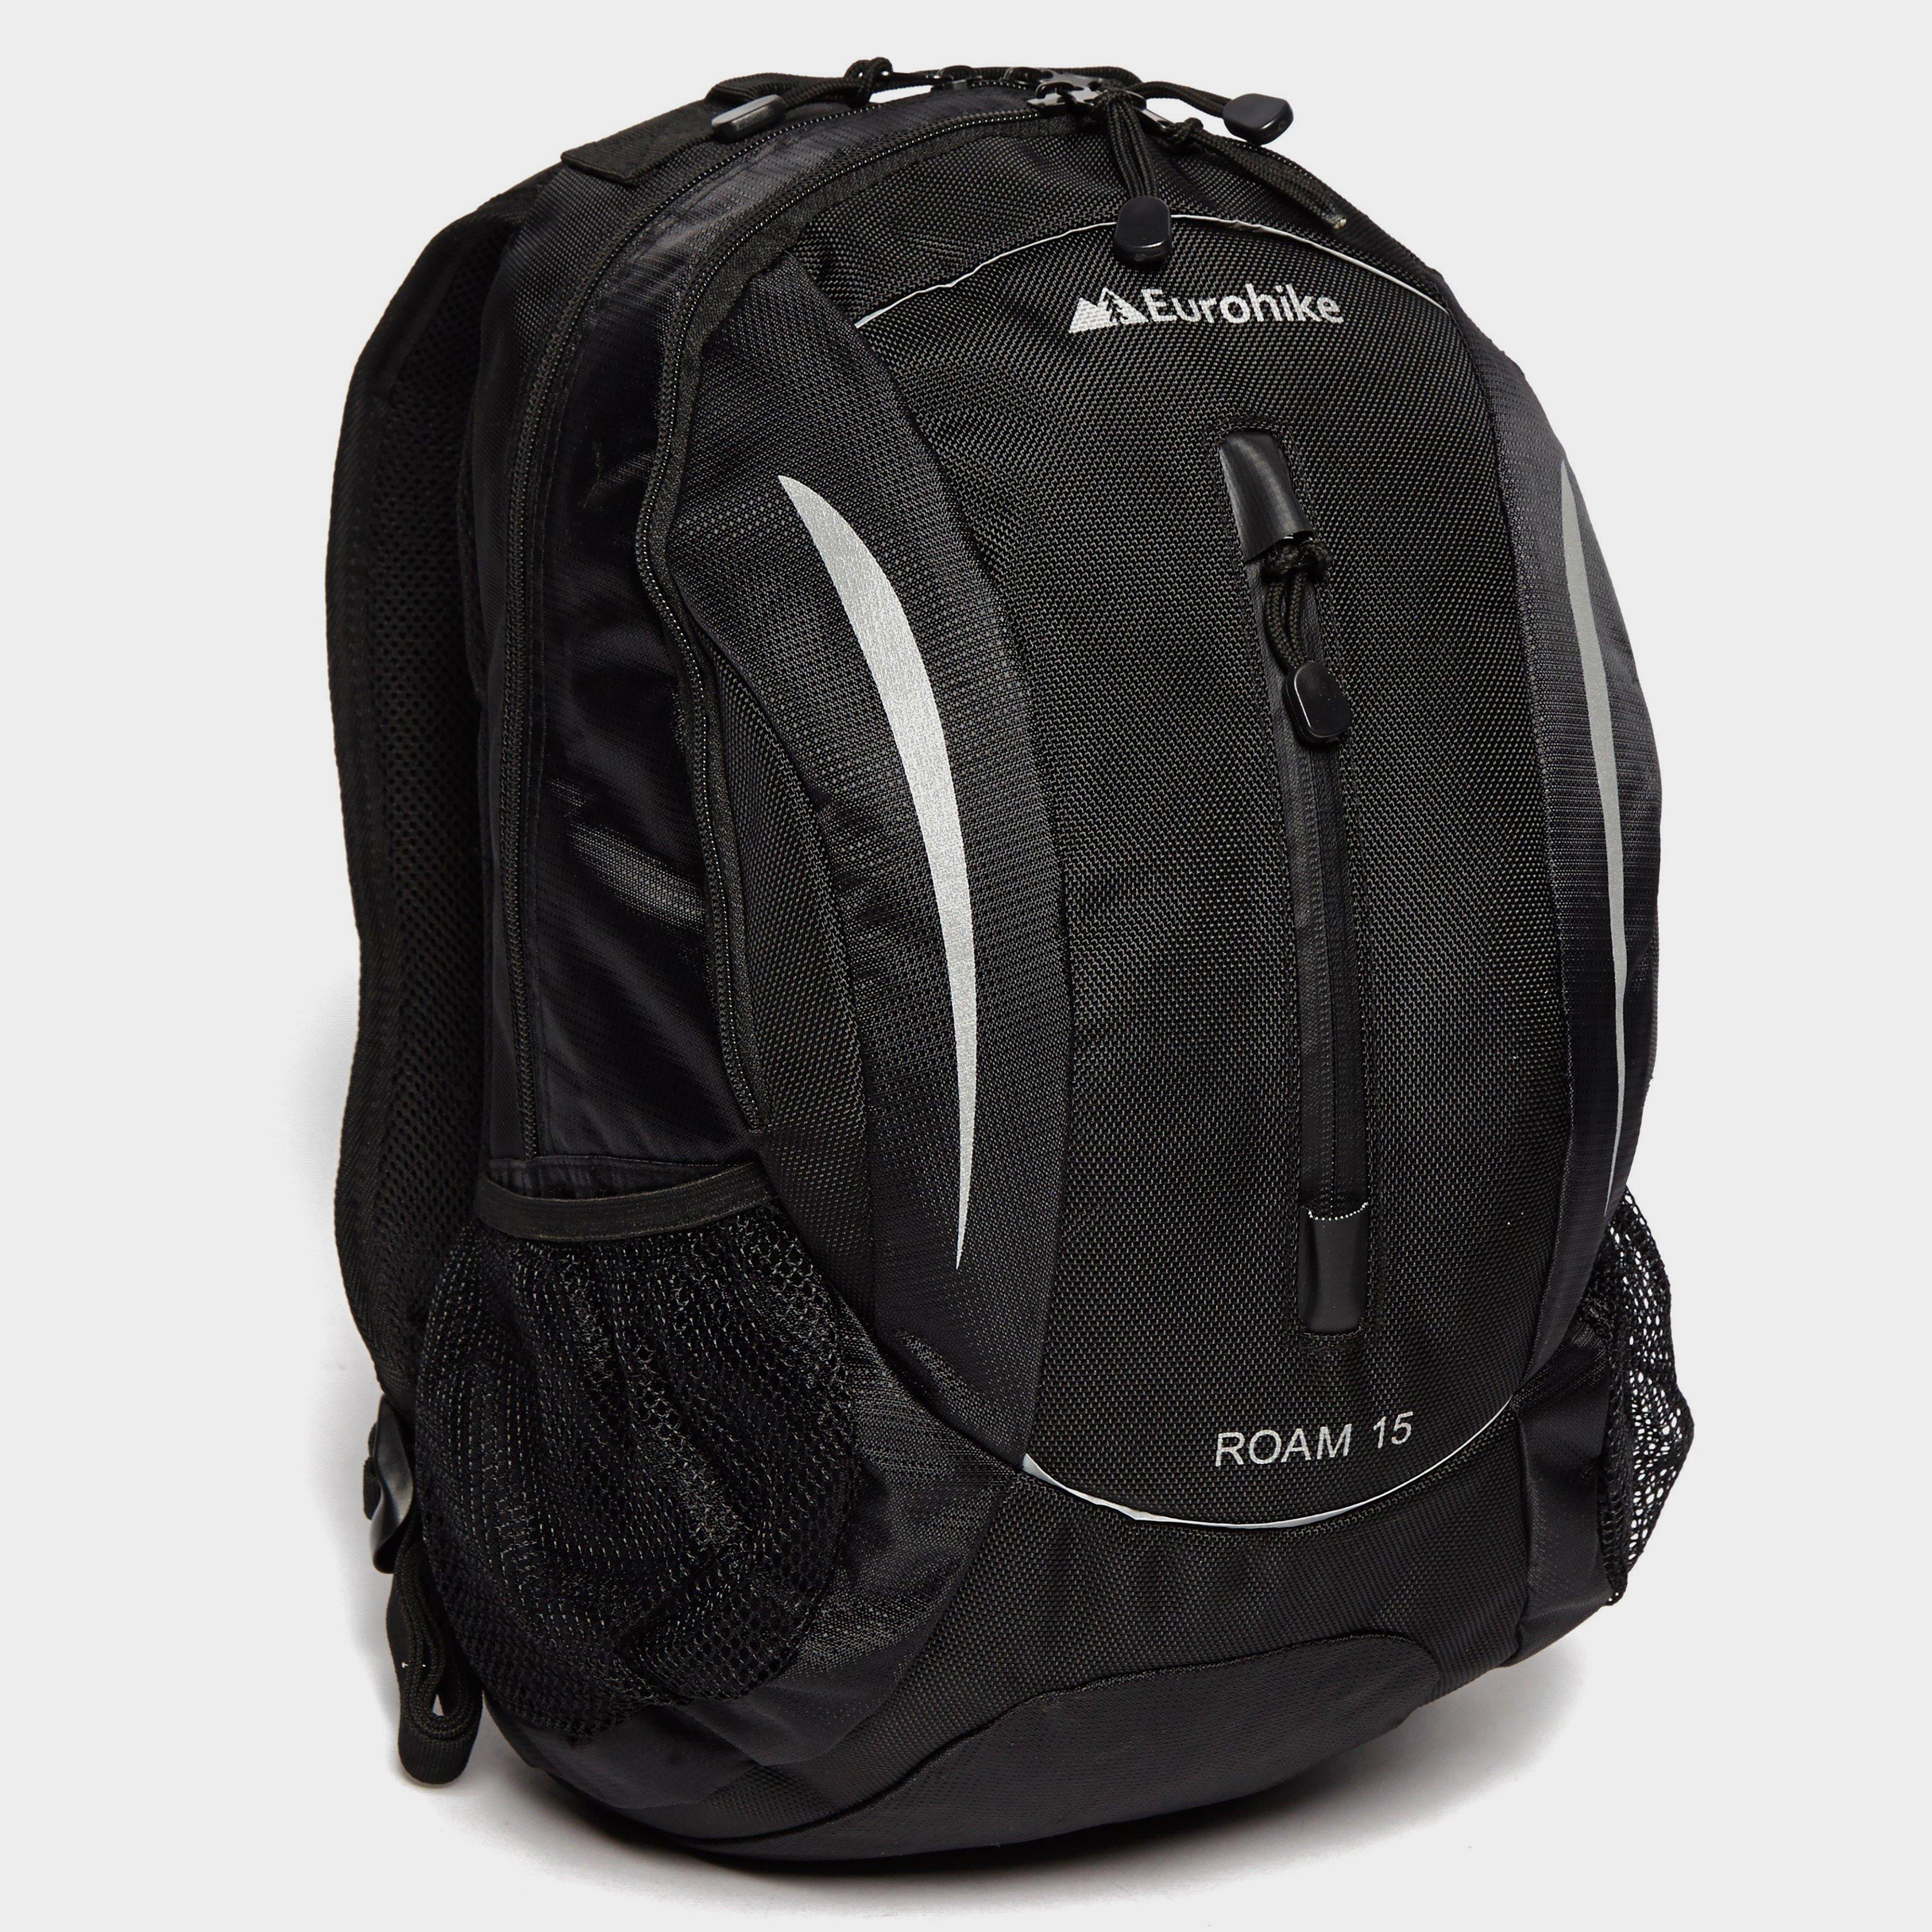 Eurohike Eurohike Roam 15L Daysack - Black, Black